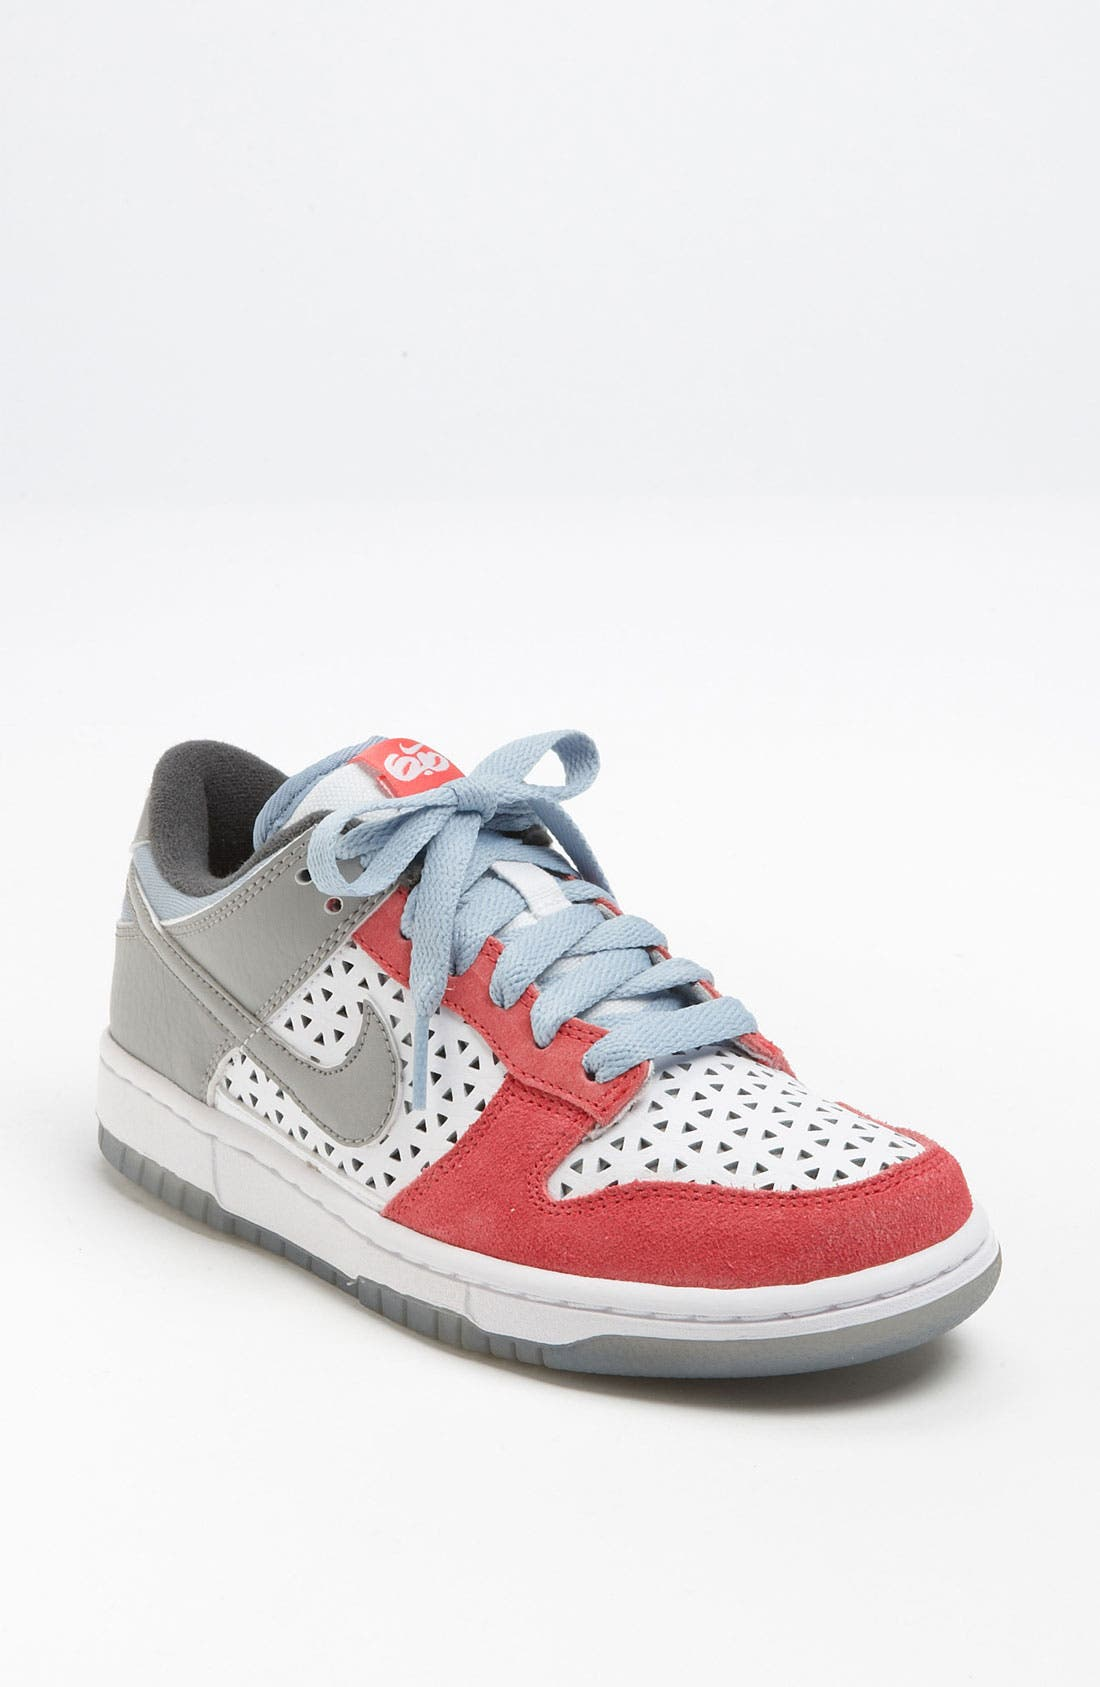 Main Image - Nike 'Dunk Low 6.0' Sneaker (Women) (Exclusive)